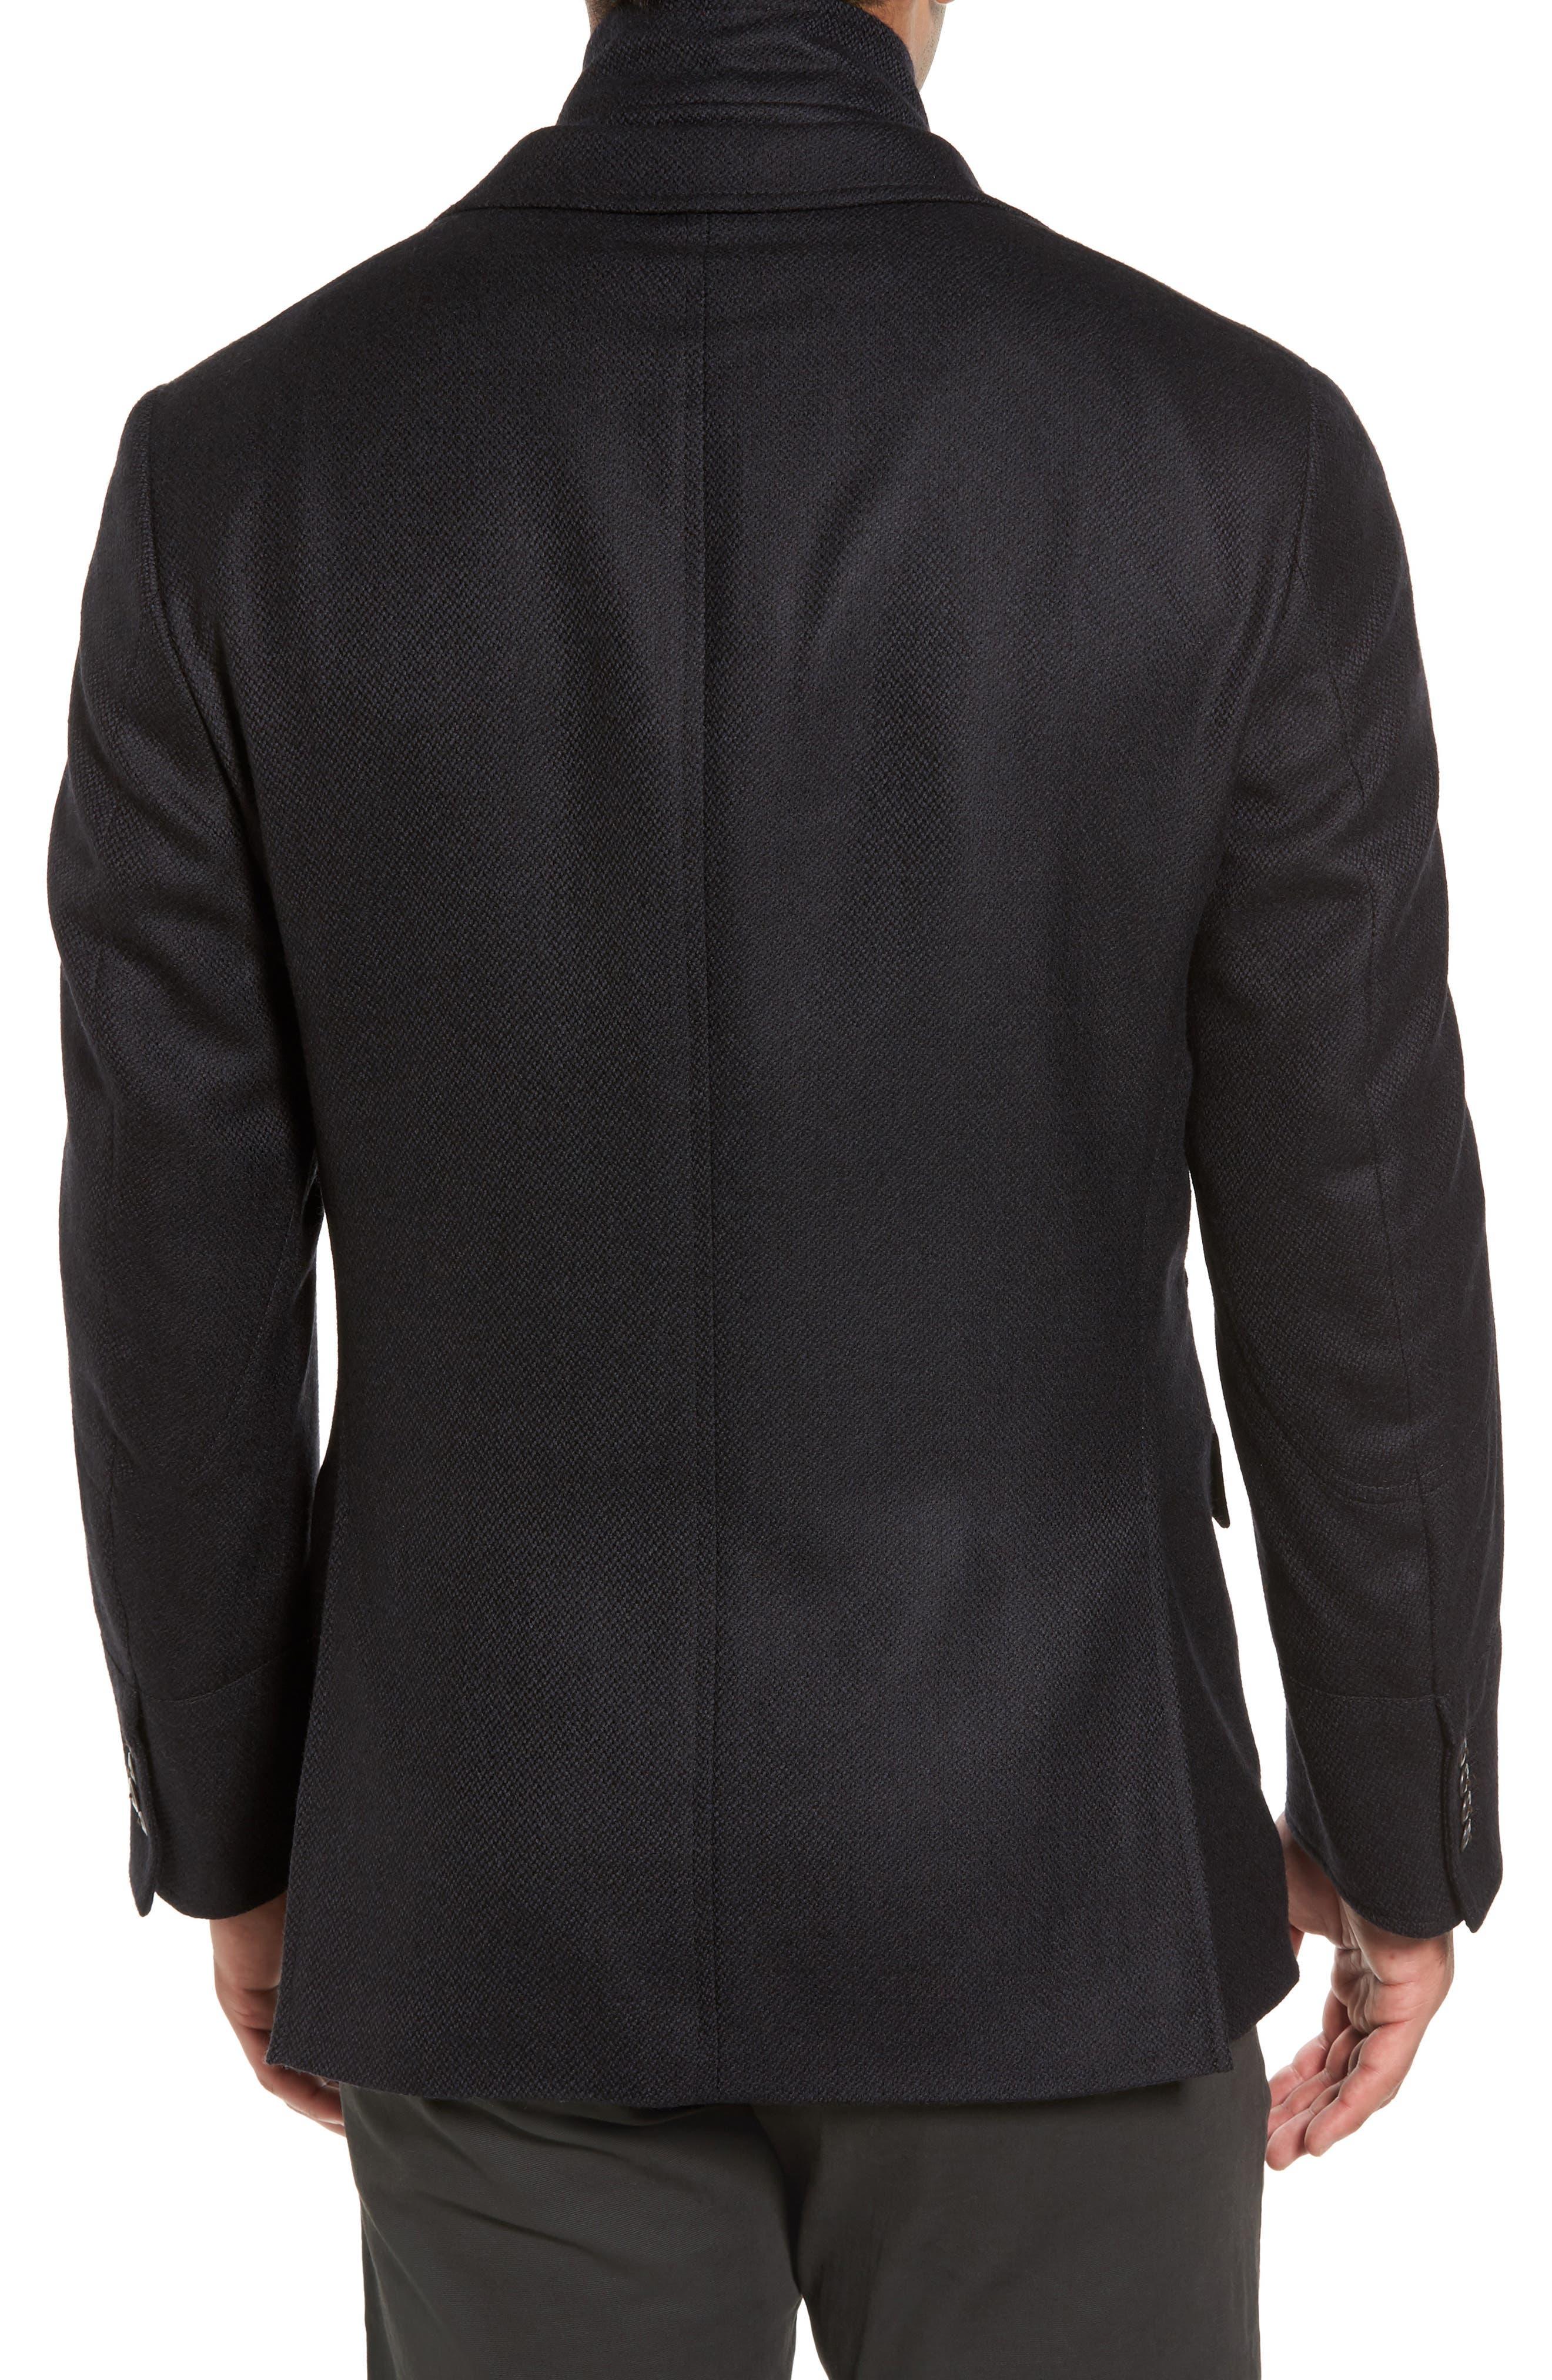 Alternate Image 2  - Kroon Ritchie Aim Hybrid Classic Fit Wool & Cashmere Sport Coat